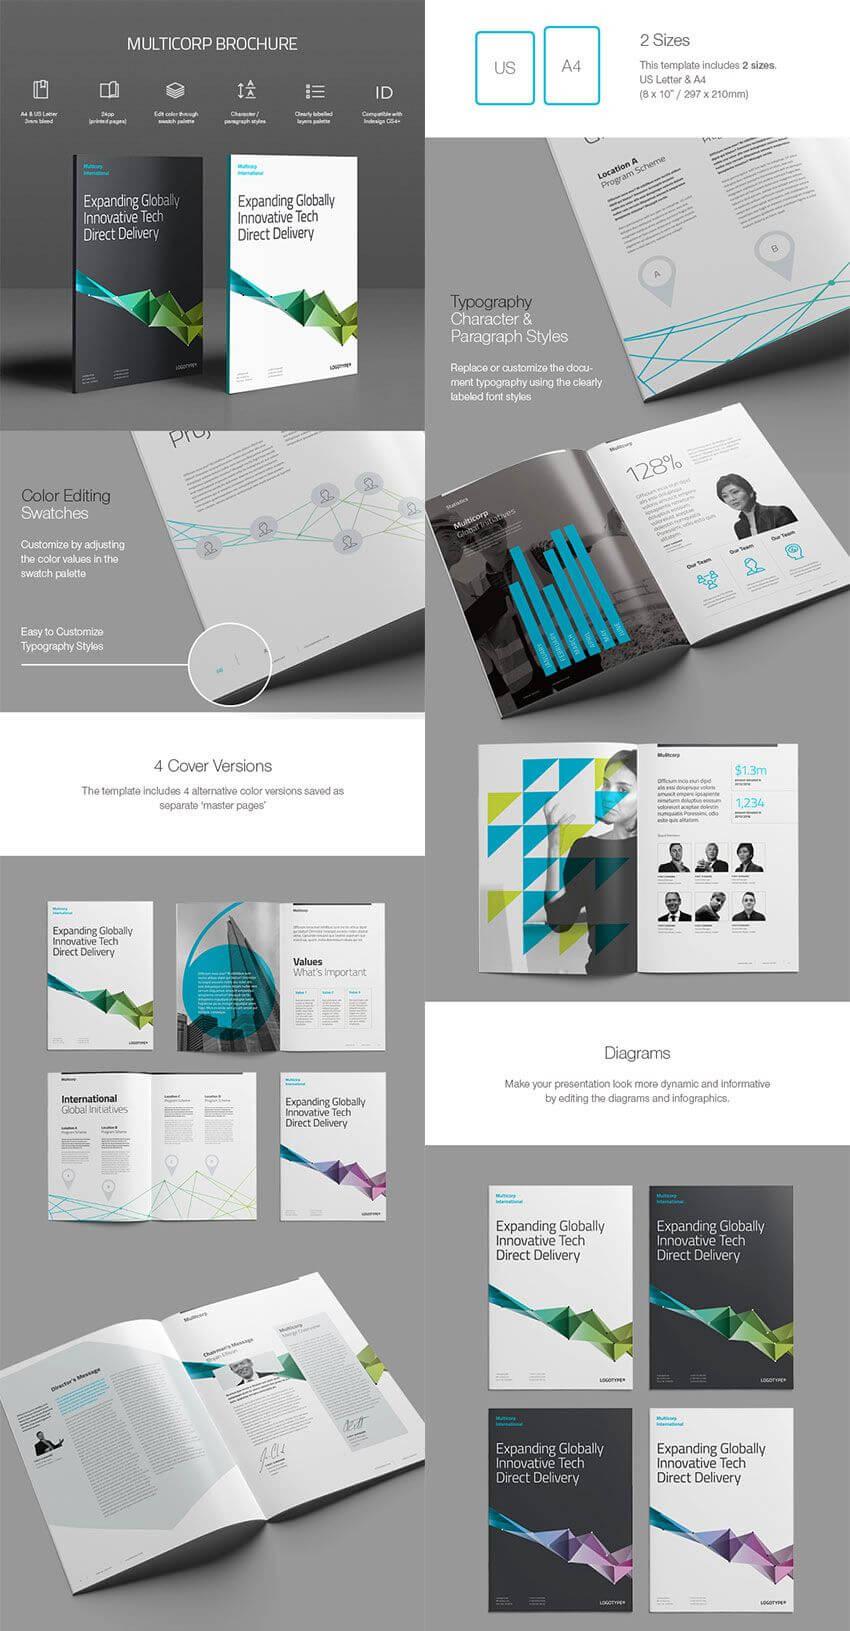 20 Best Indesign Brochure Templates - For Creative Business inside Brochure Templates Free Download Indesign